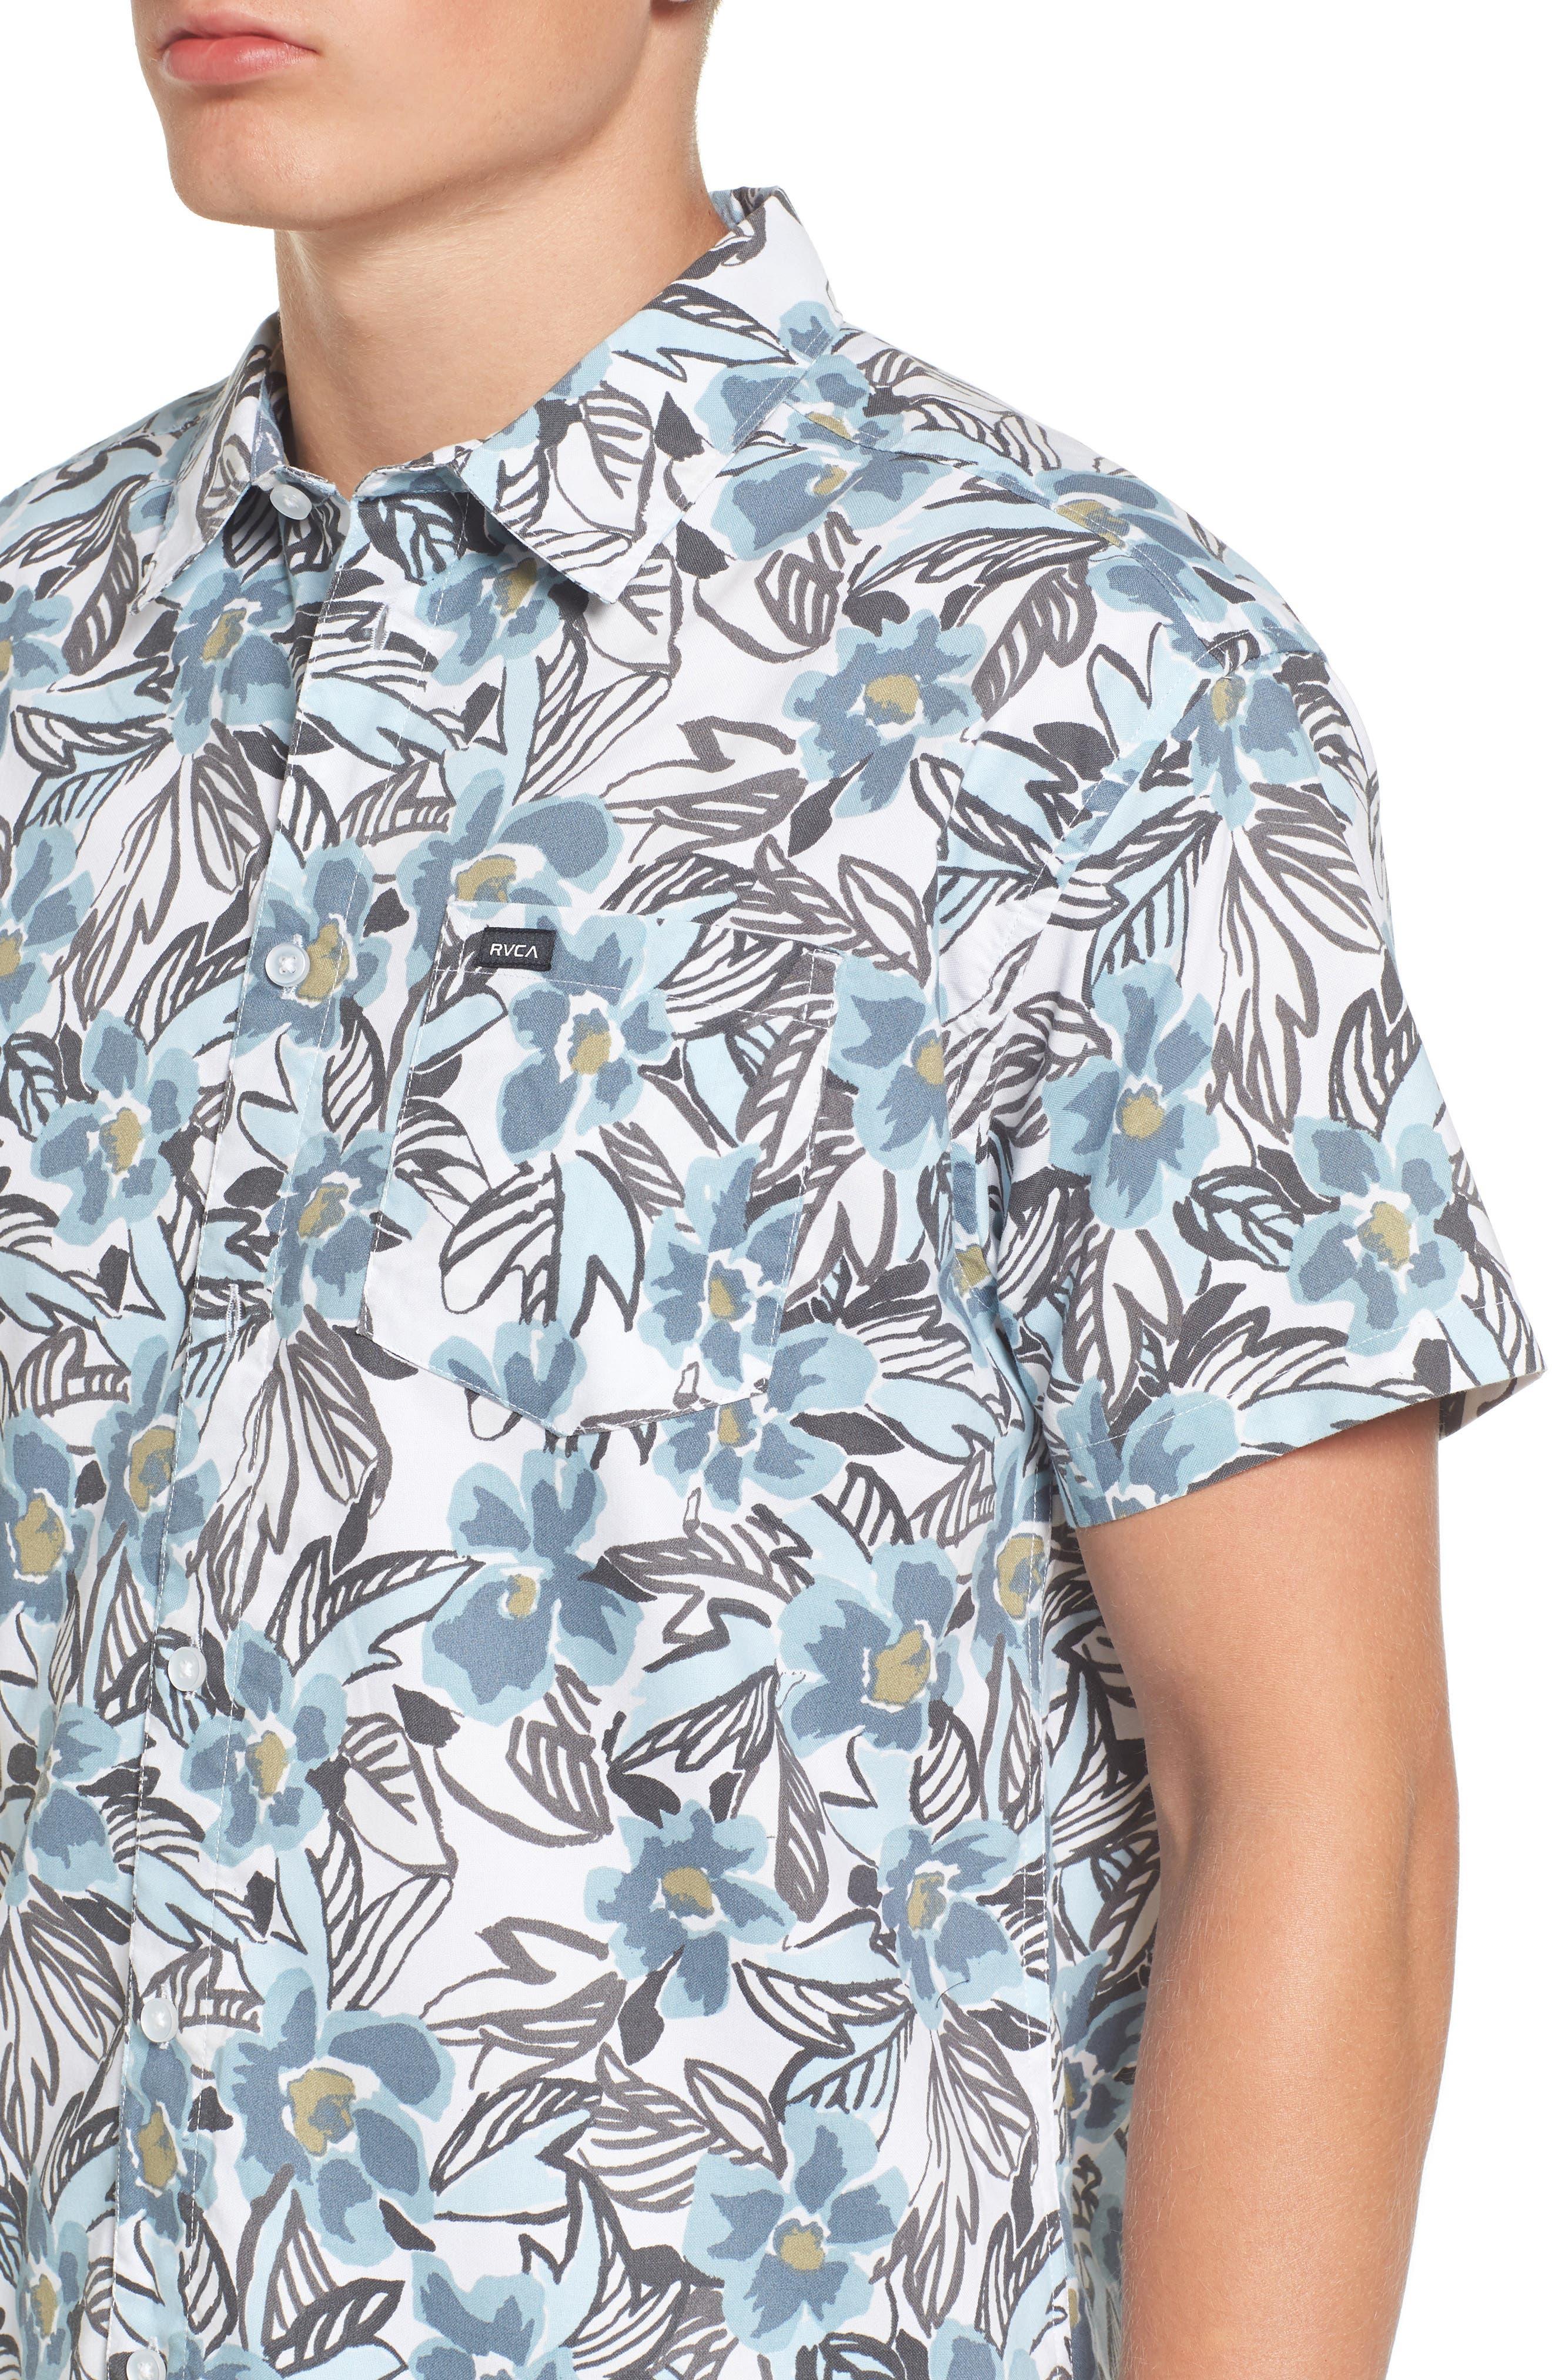 Paradise Valley Floral Woven Shirt,                             Alternate thumbnail 4, color,                             142